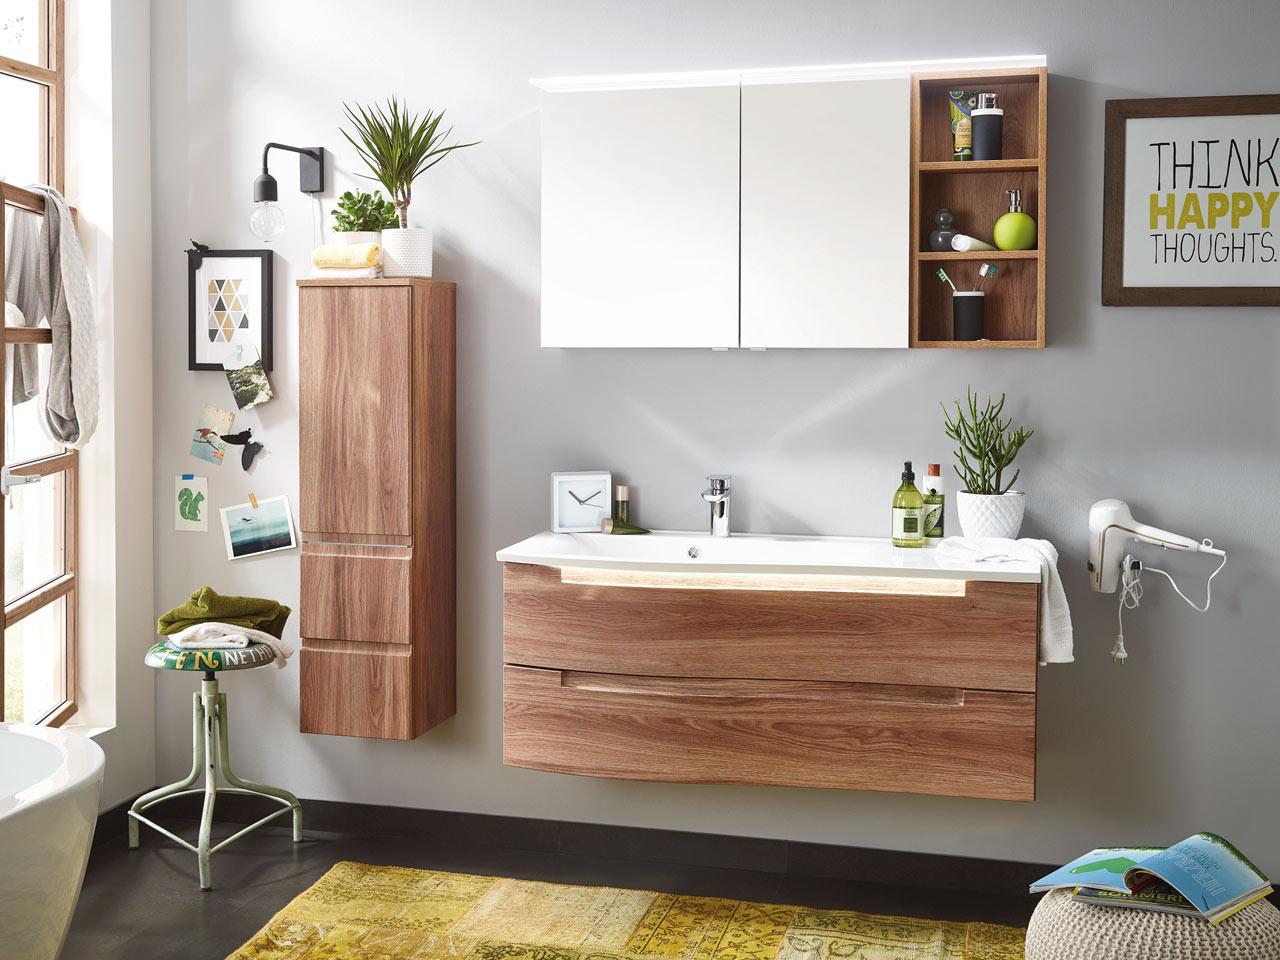 Badezimmer Holzoptik Dekoration